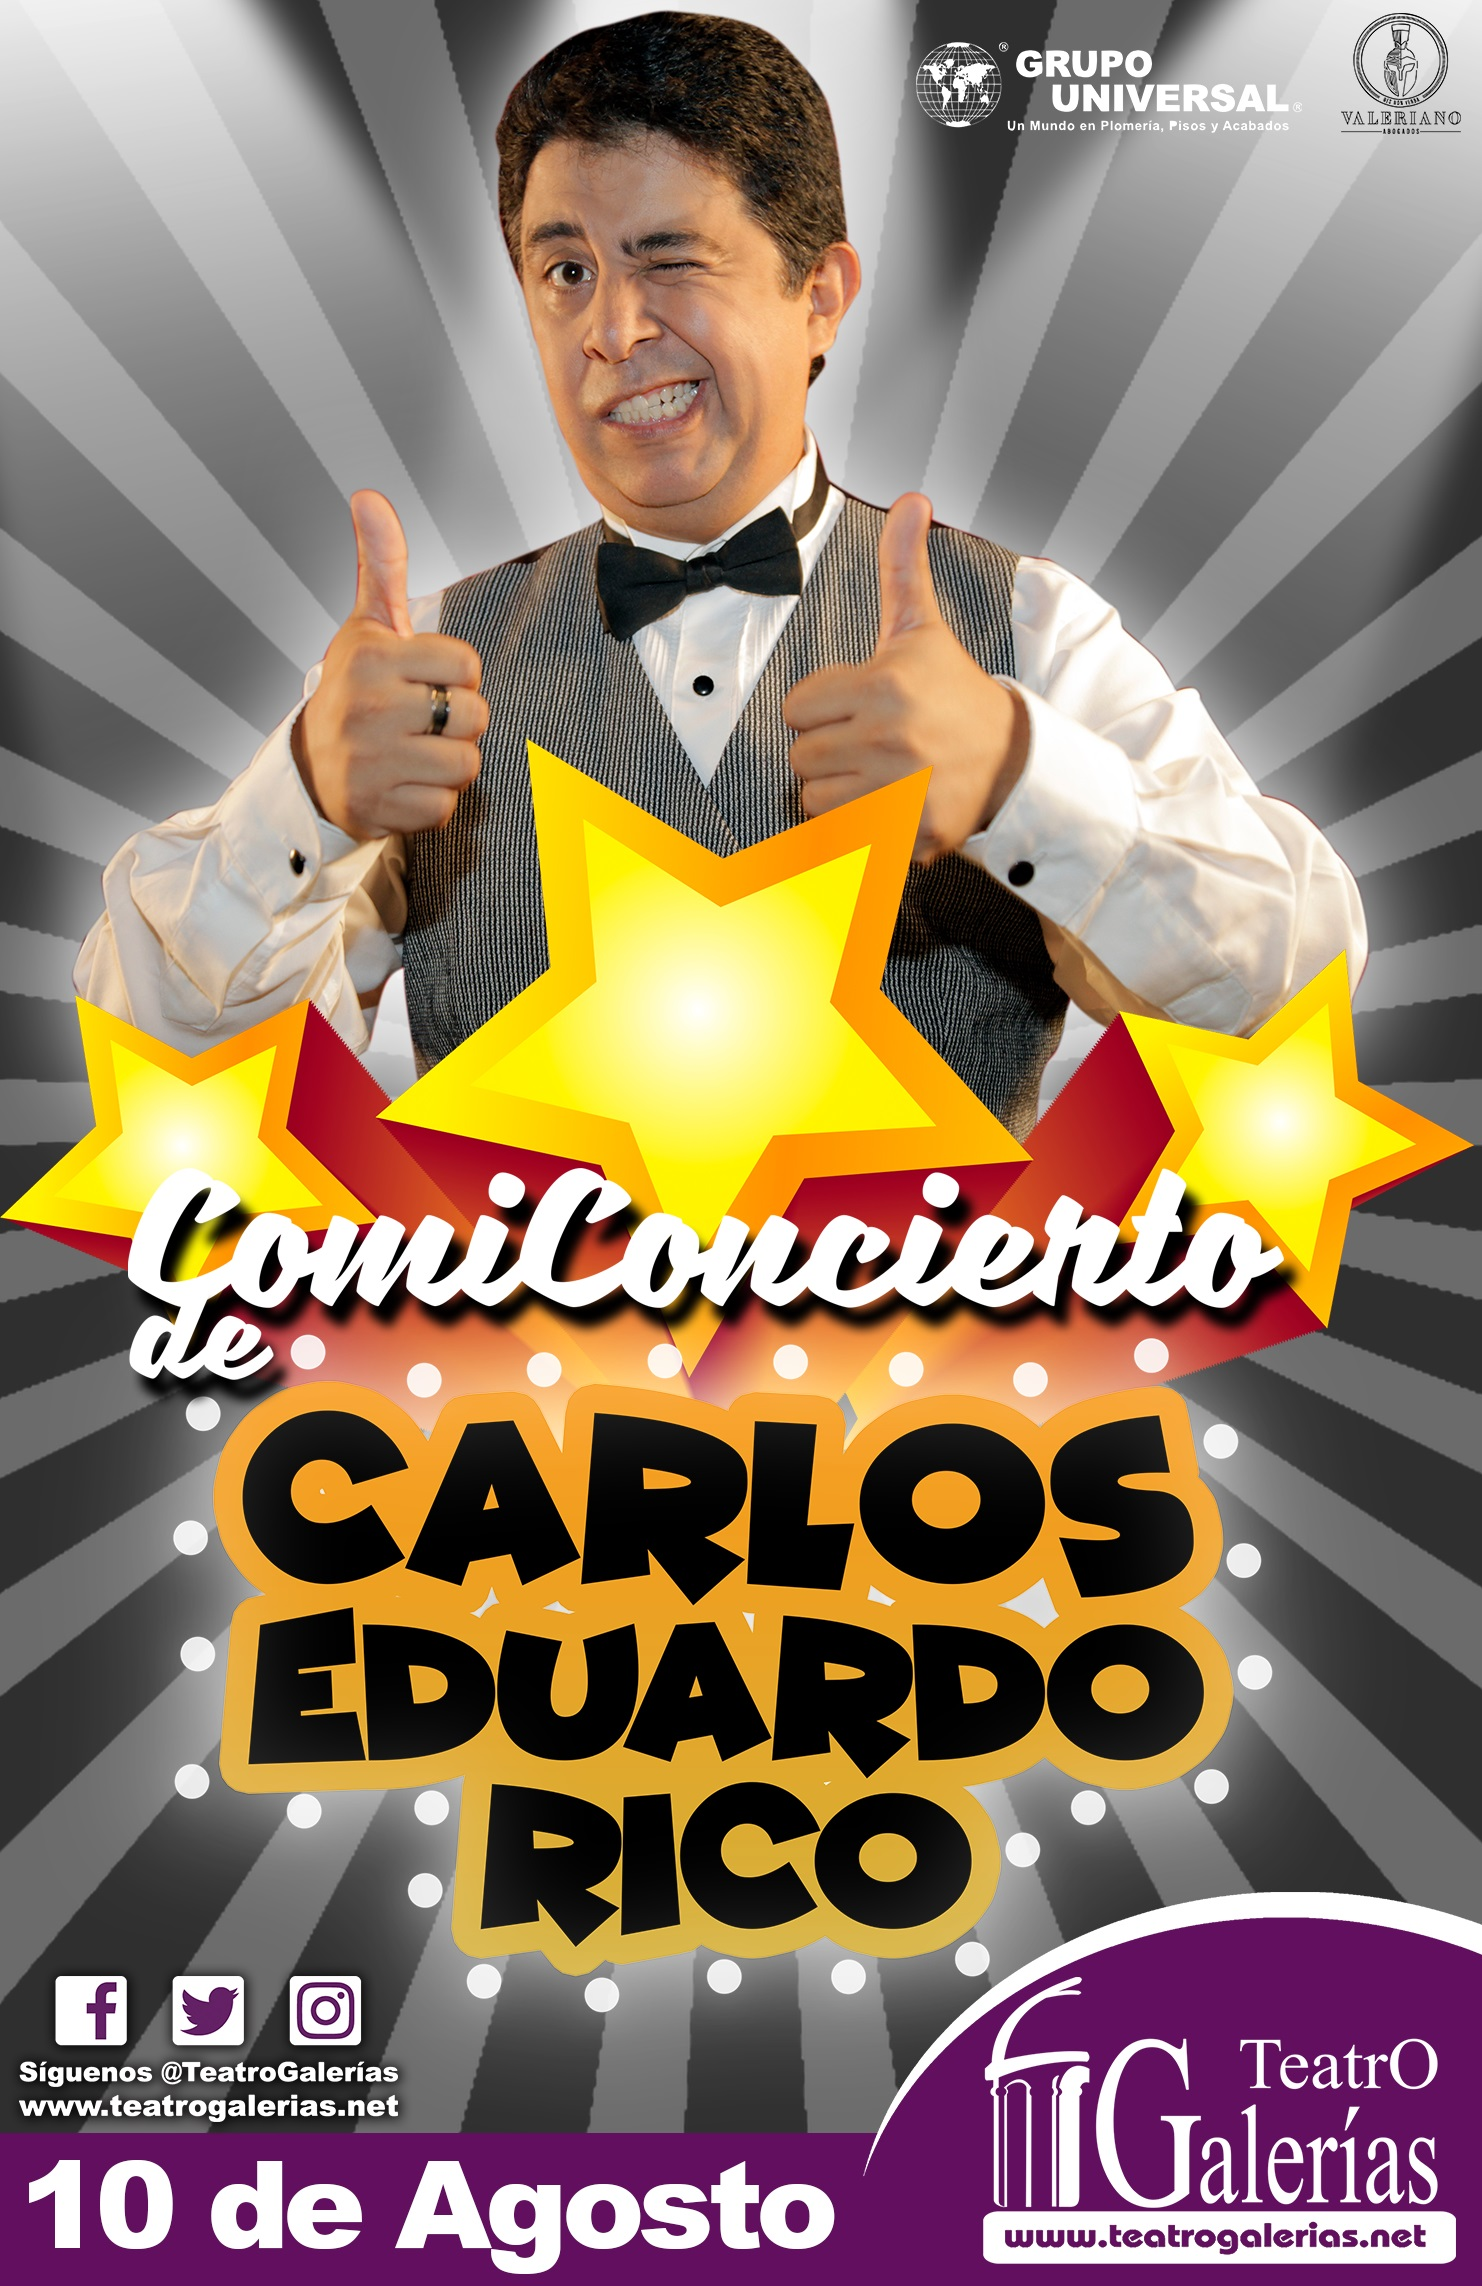 Carlos Eduardo Rico / Teatro Galerías